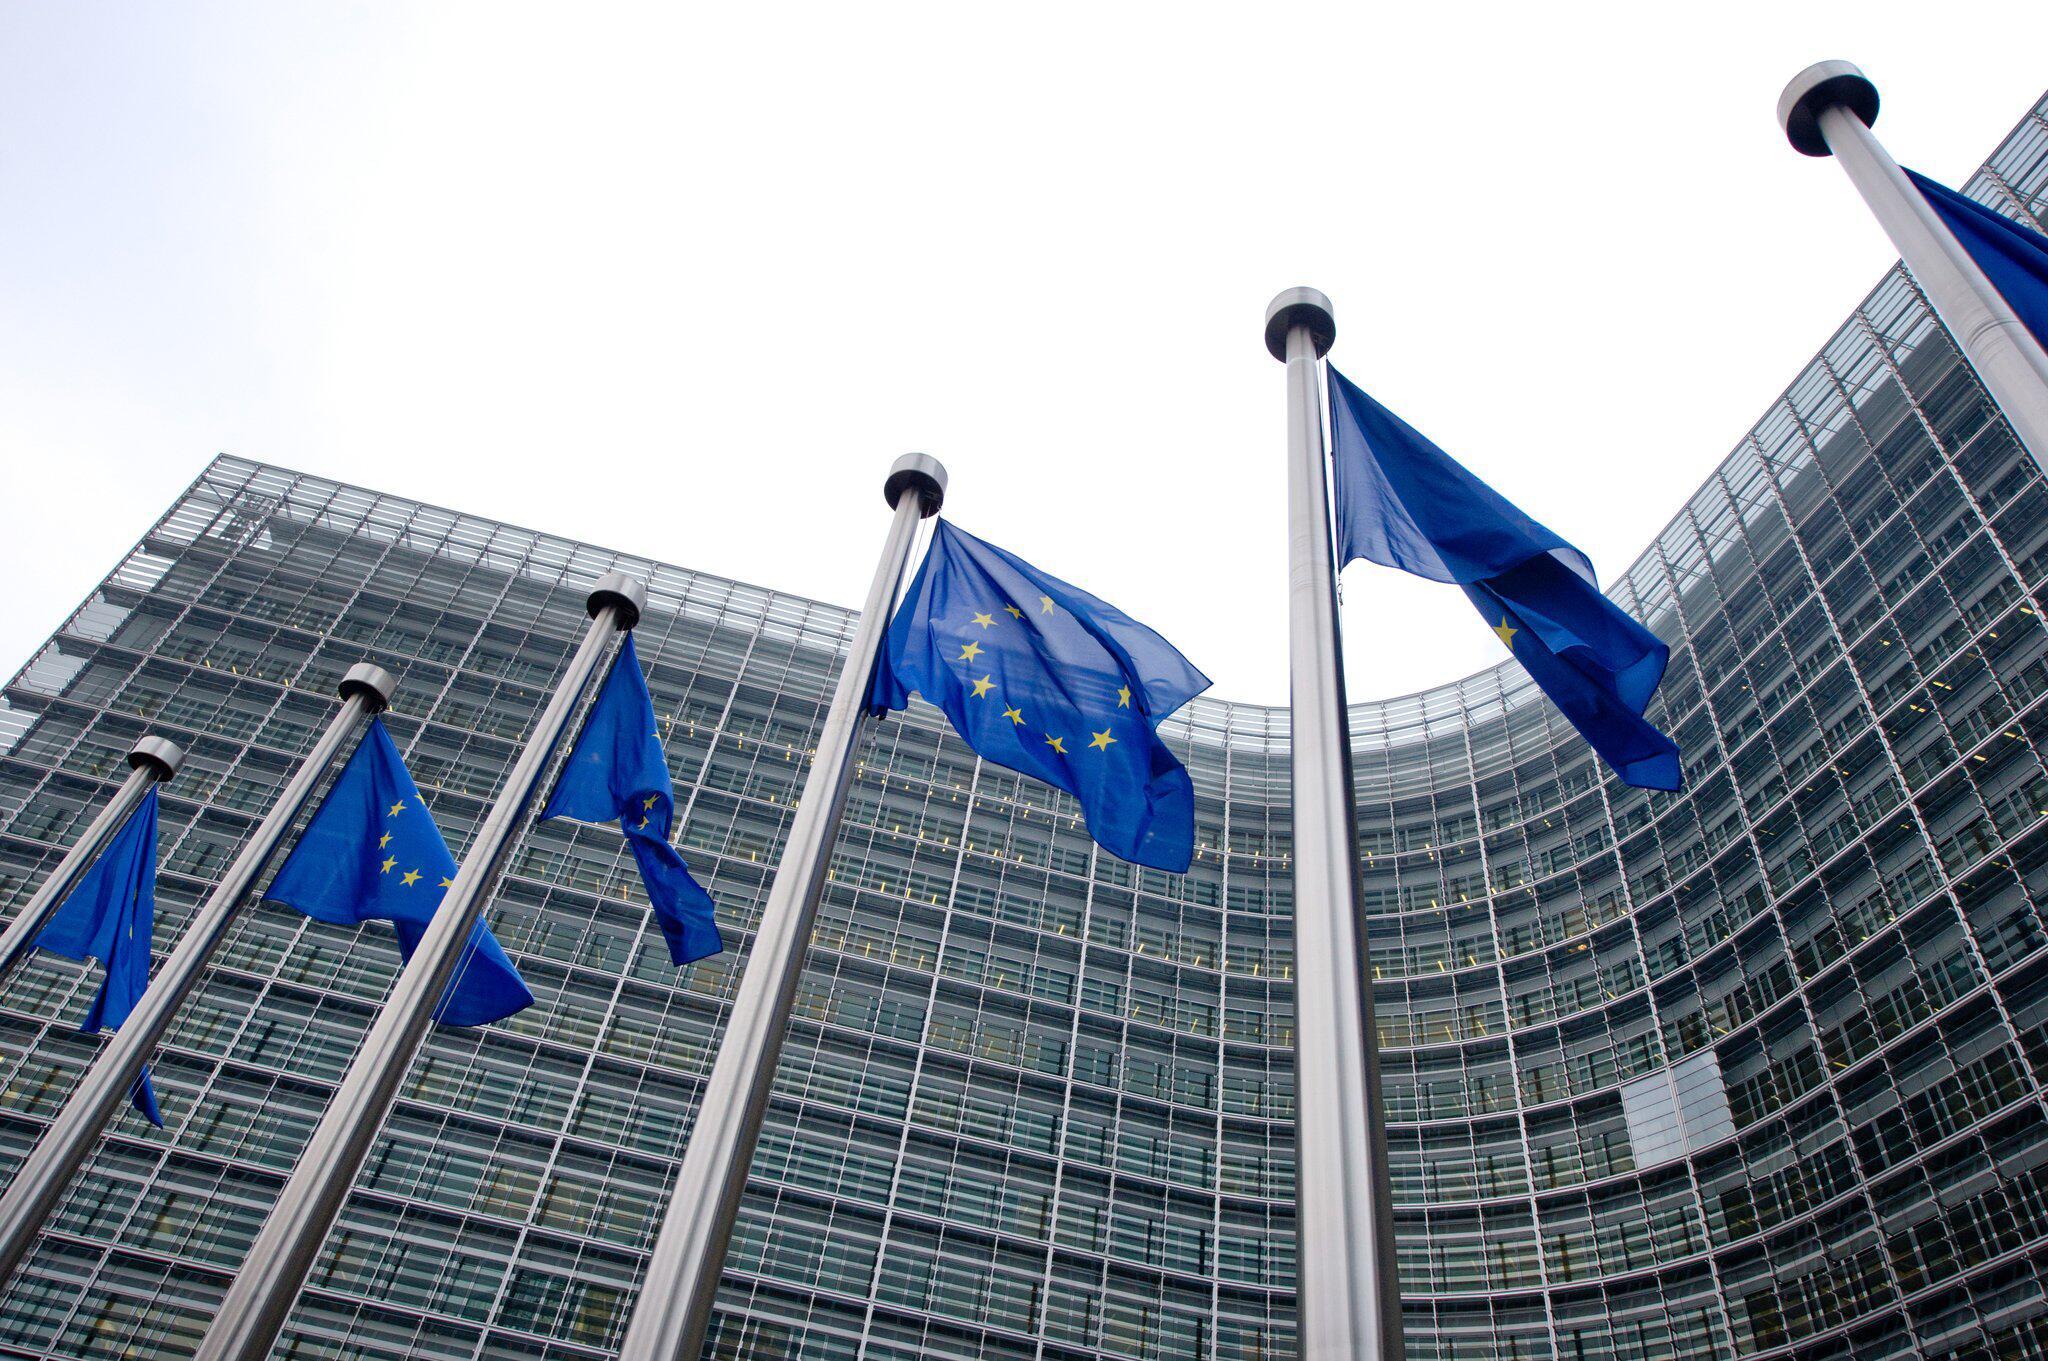 Bild zu Bürokratie in der EU